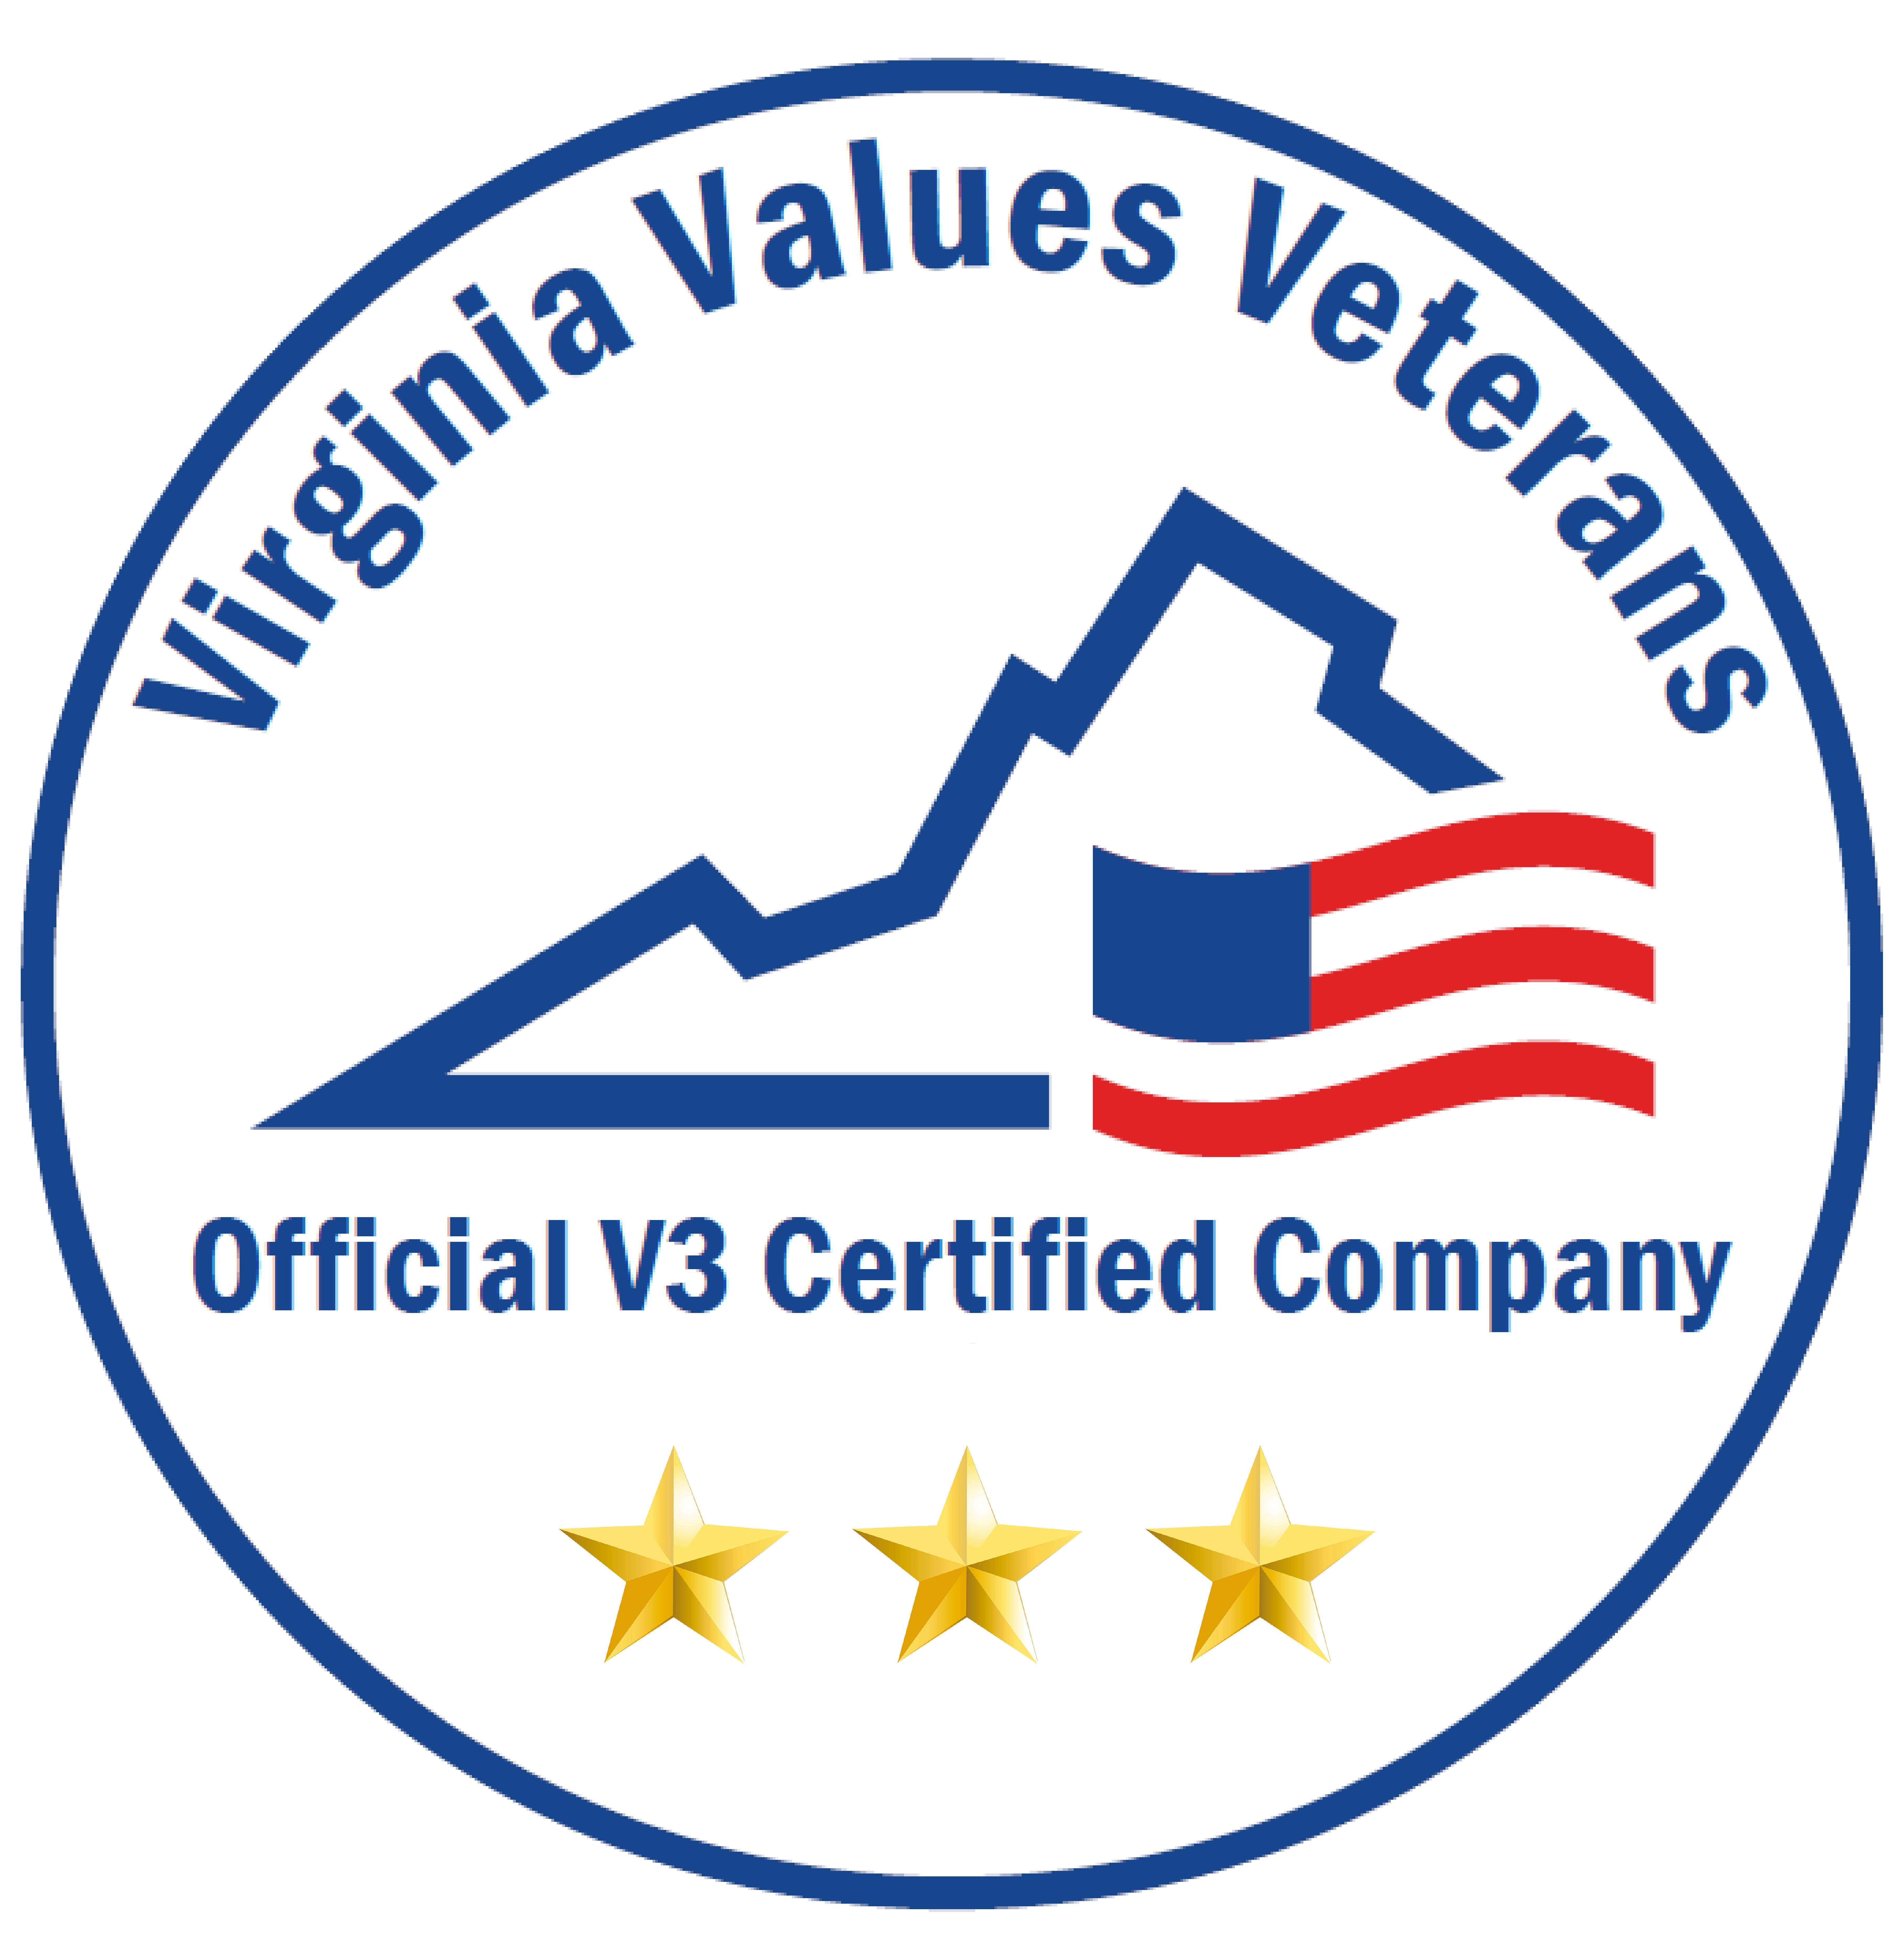 V3 certified Company